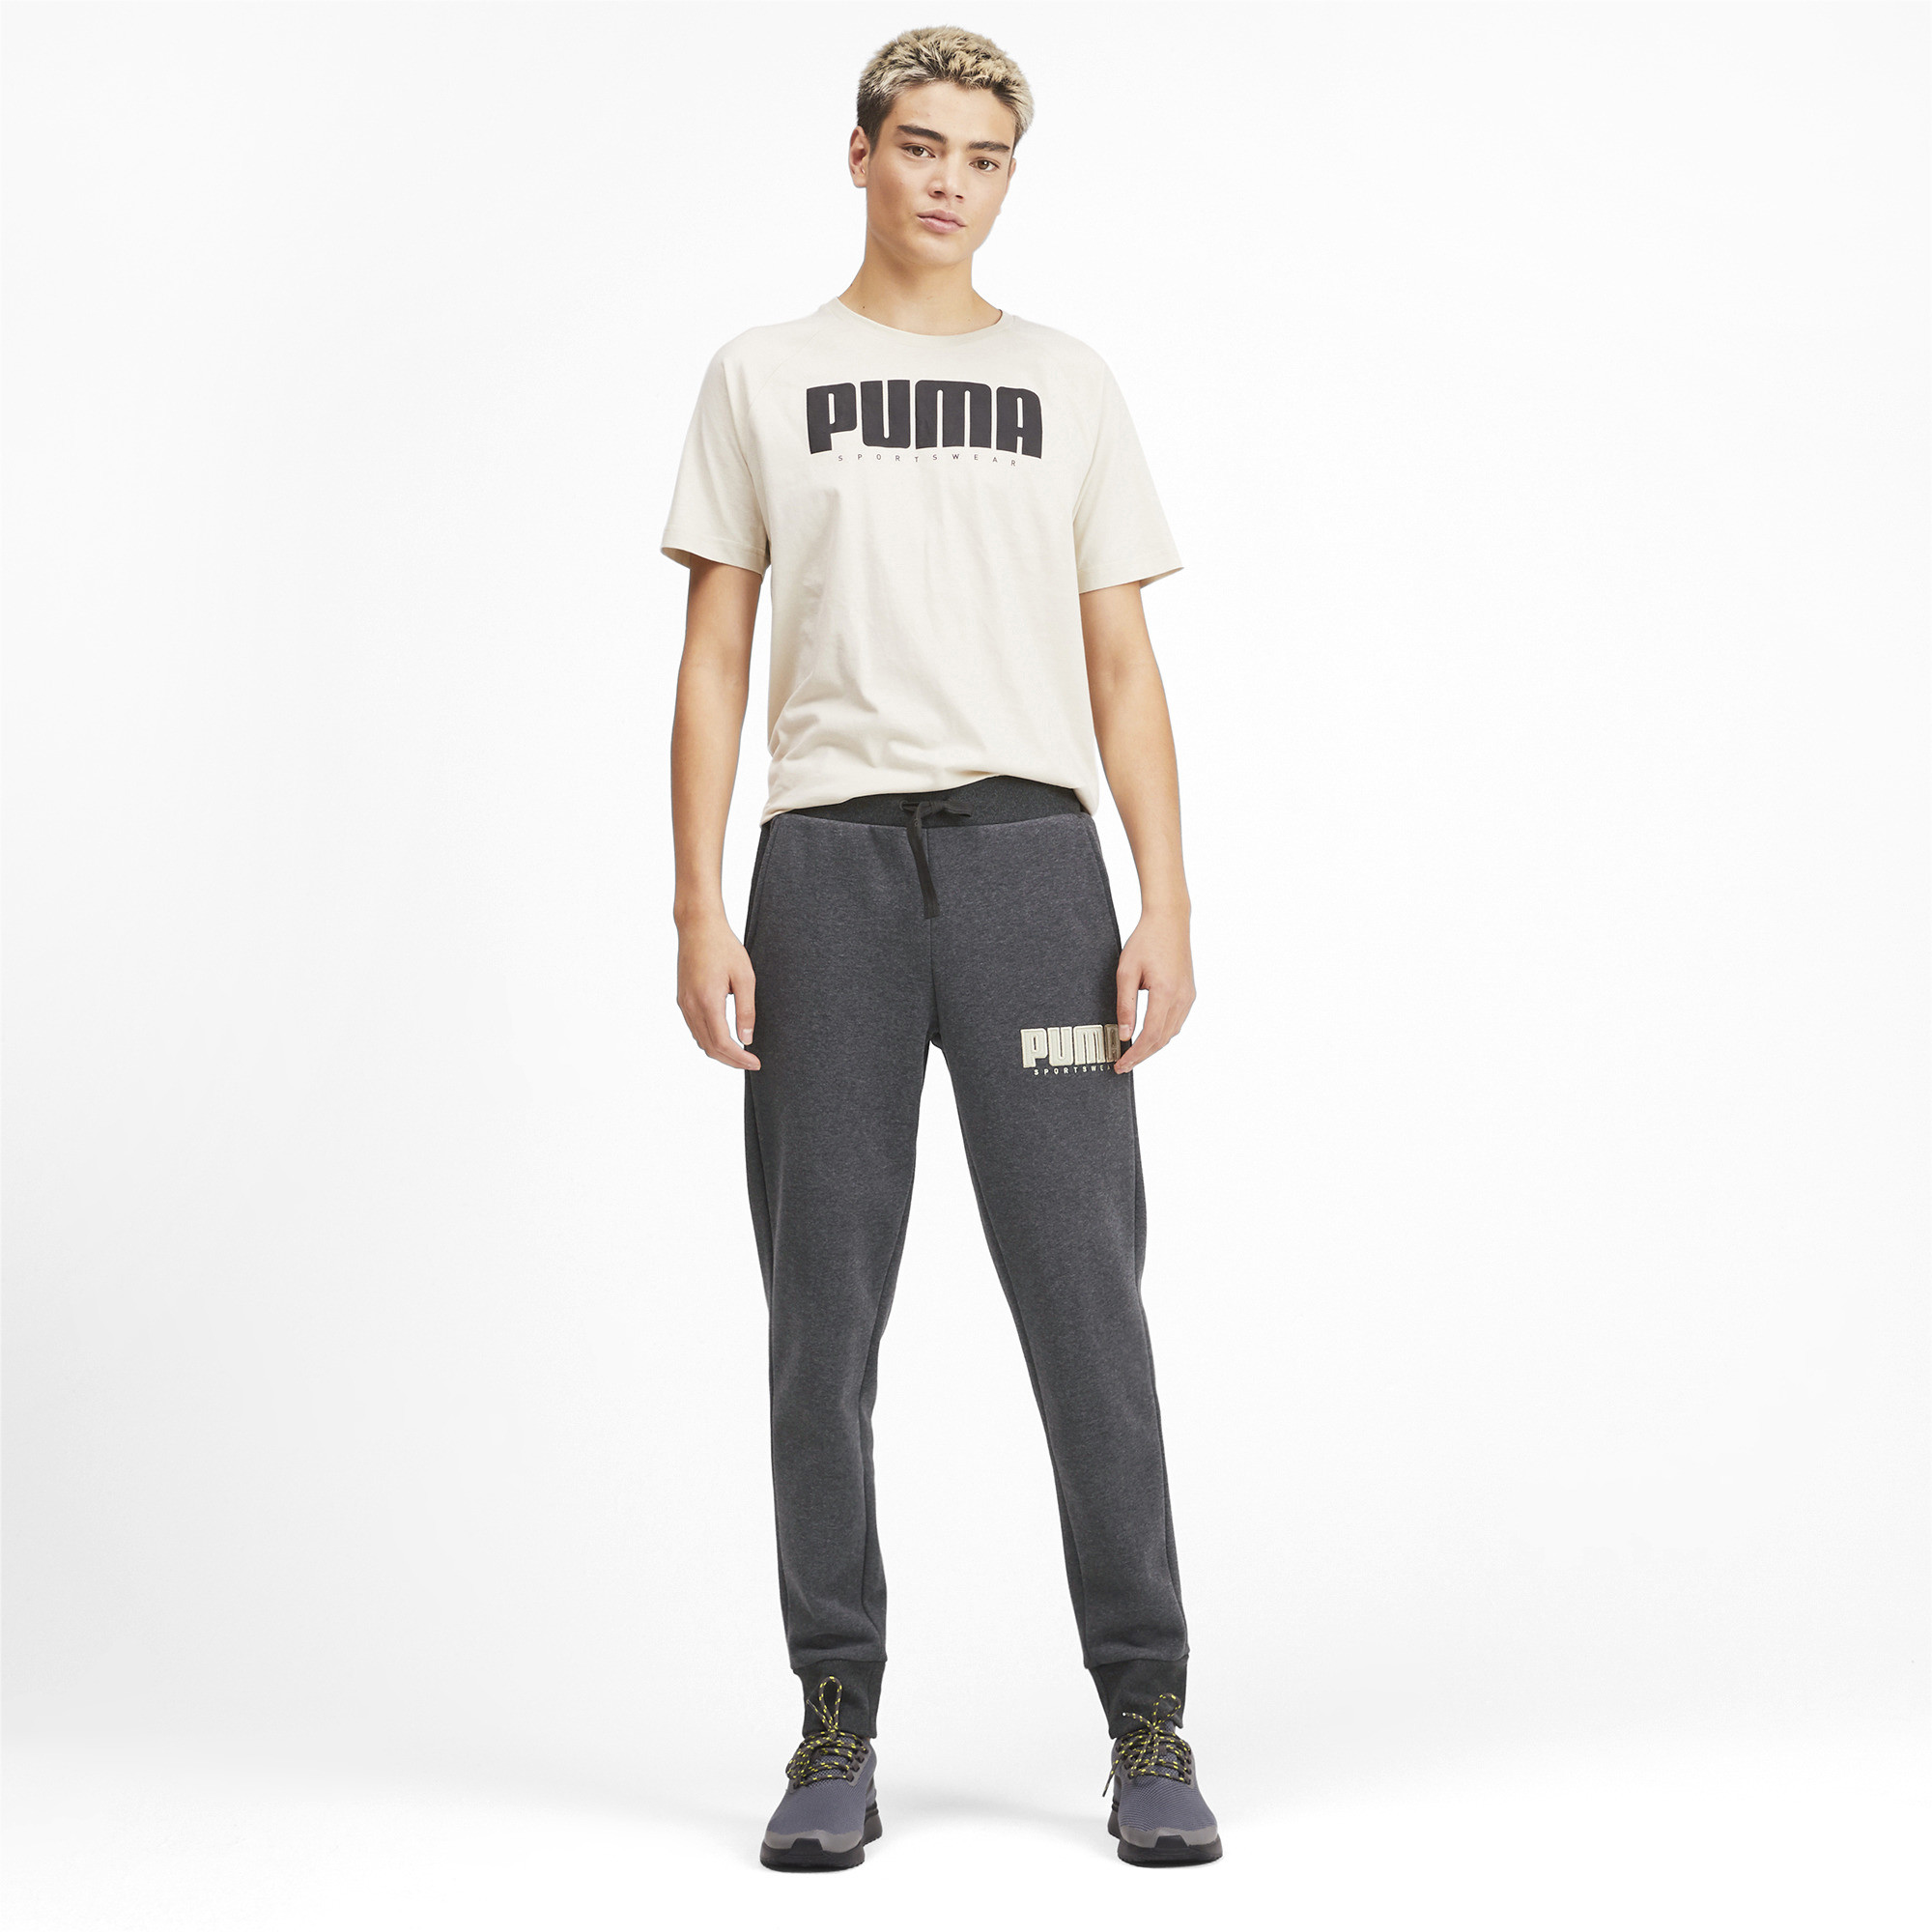 PUMA-Athletics-Men-039-s-Fleece-Pants-Men-Knitted-Pants-Basics thumbnail 6